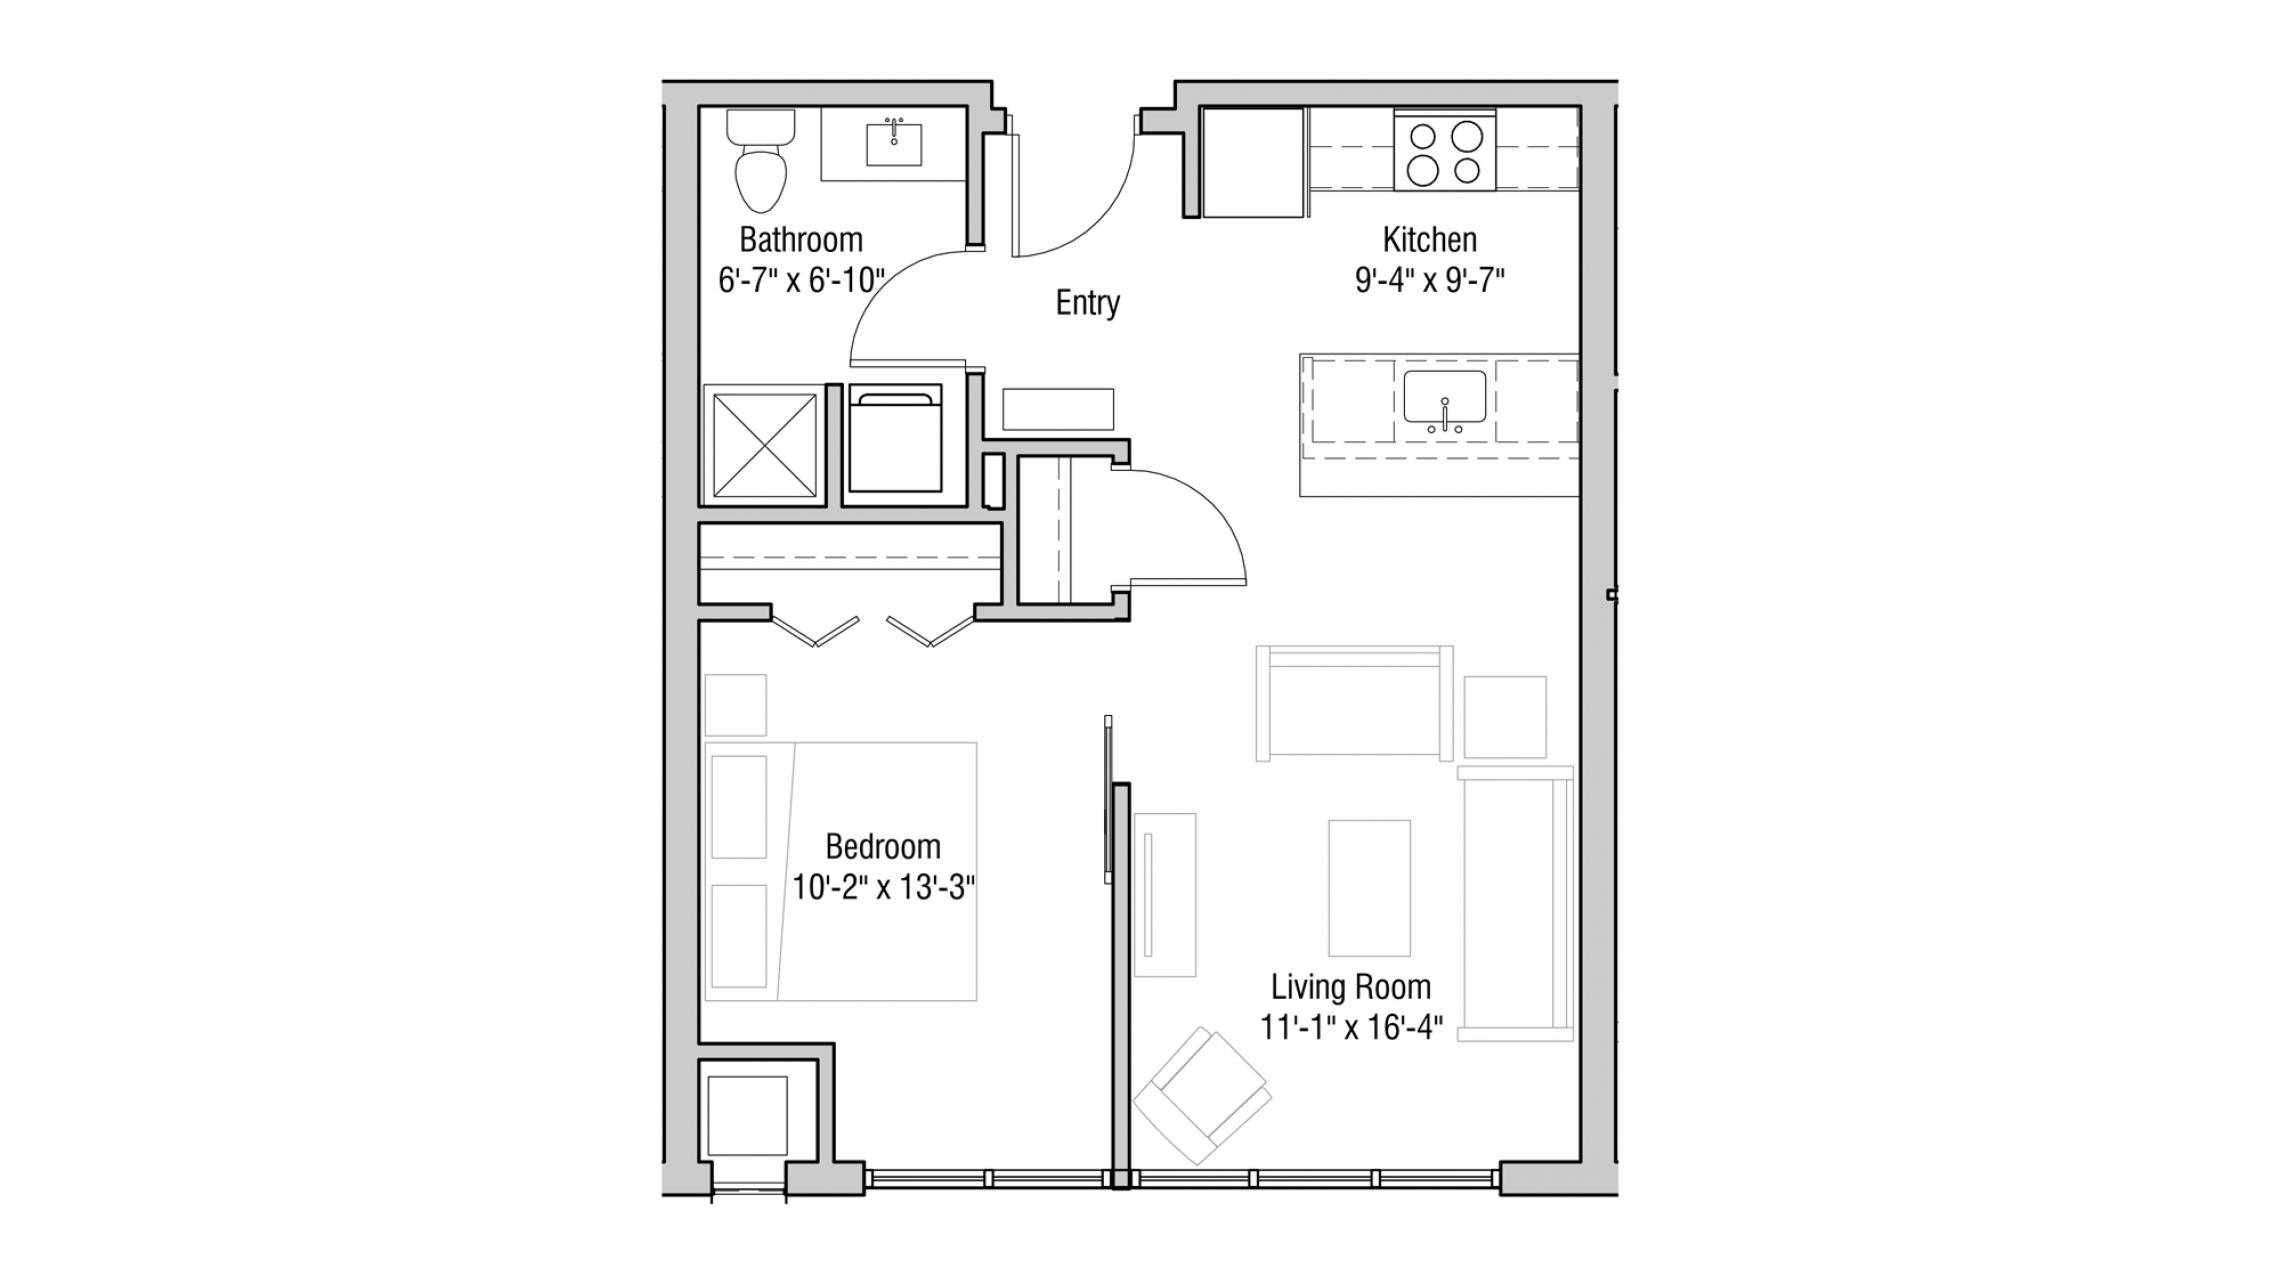 ULI Quarter Row 209 - One Bedroom, One Bathroom